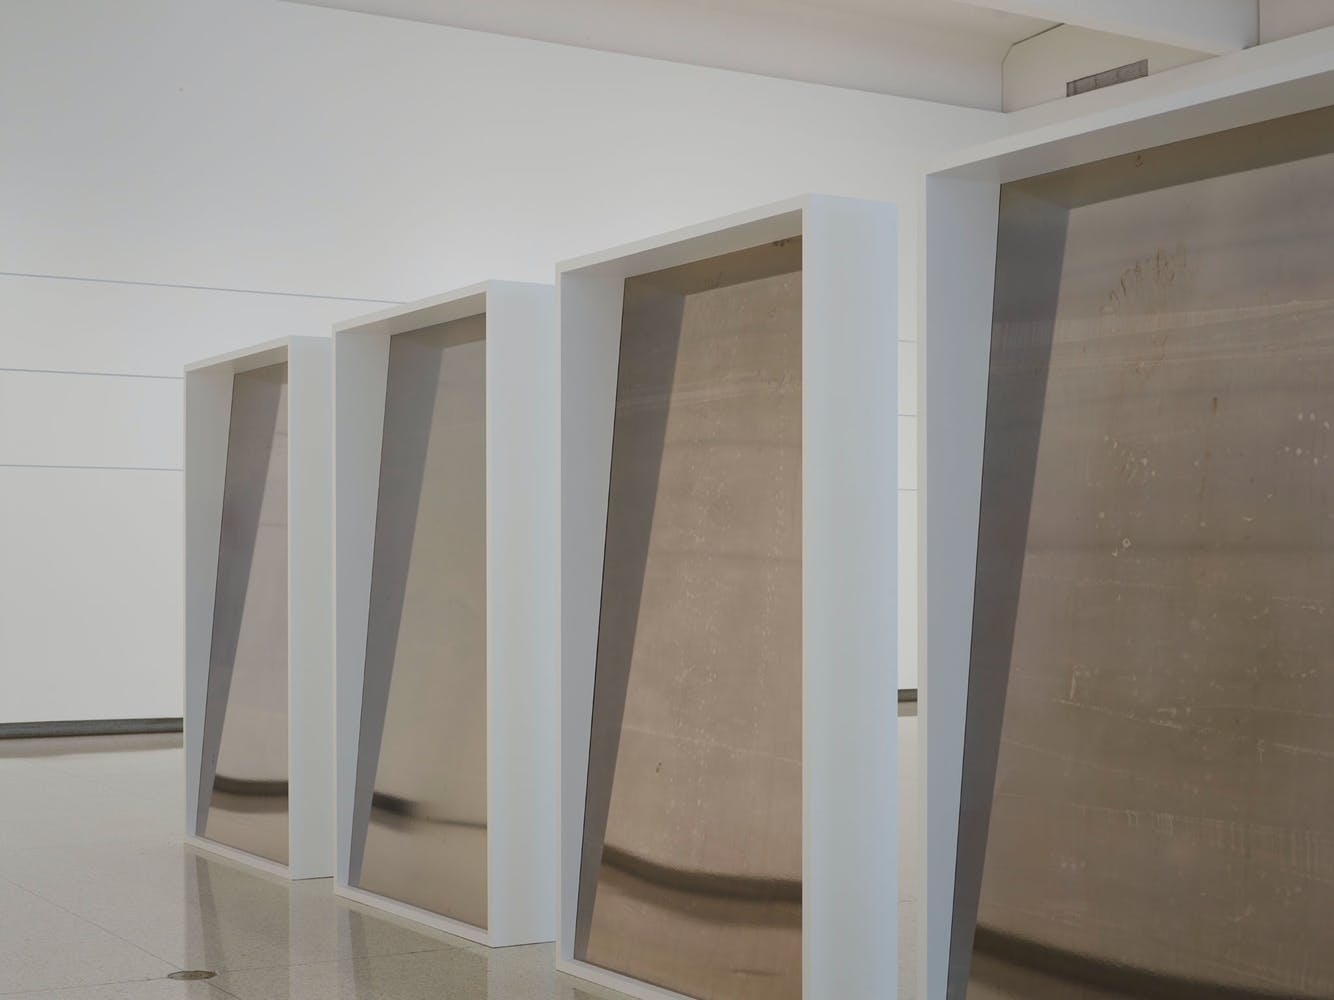 View of the exhibition Liz Deschenes: Gallery 7, 2014